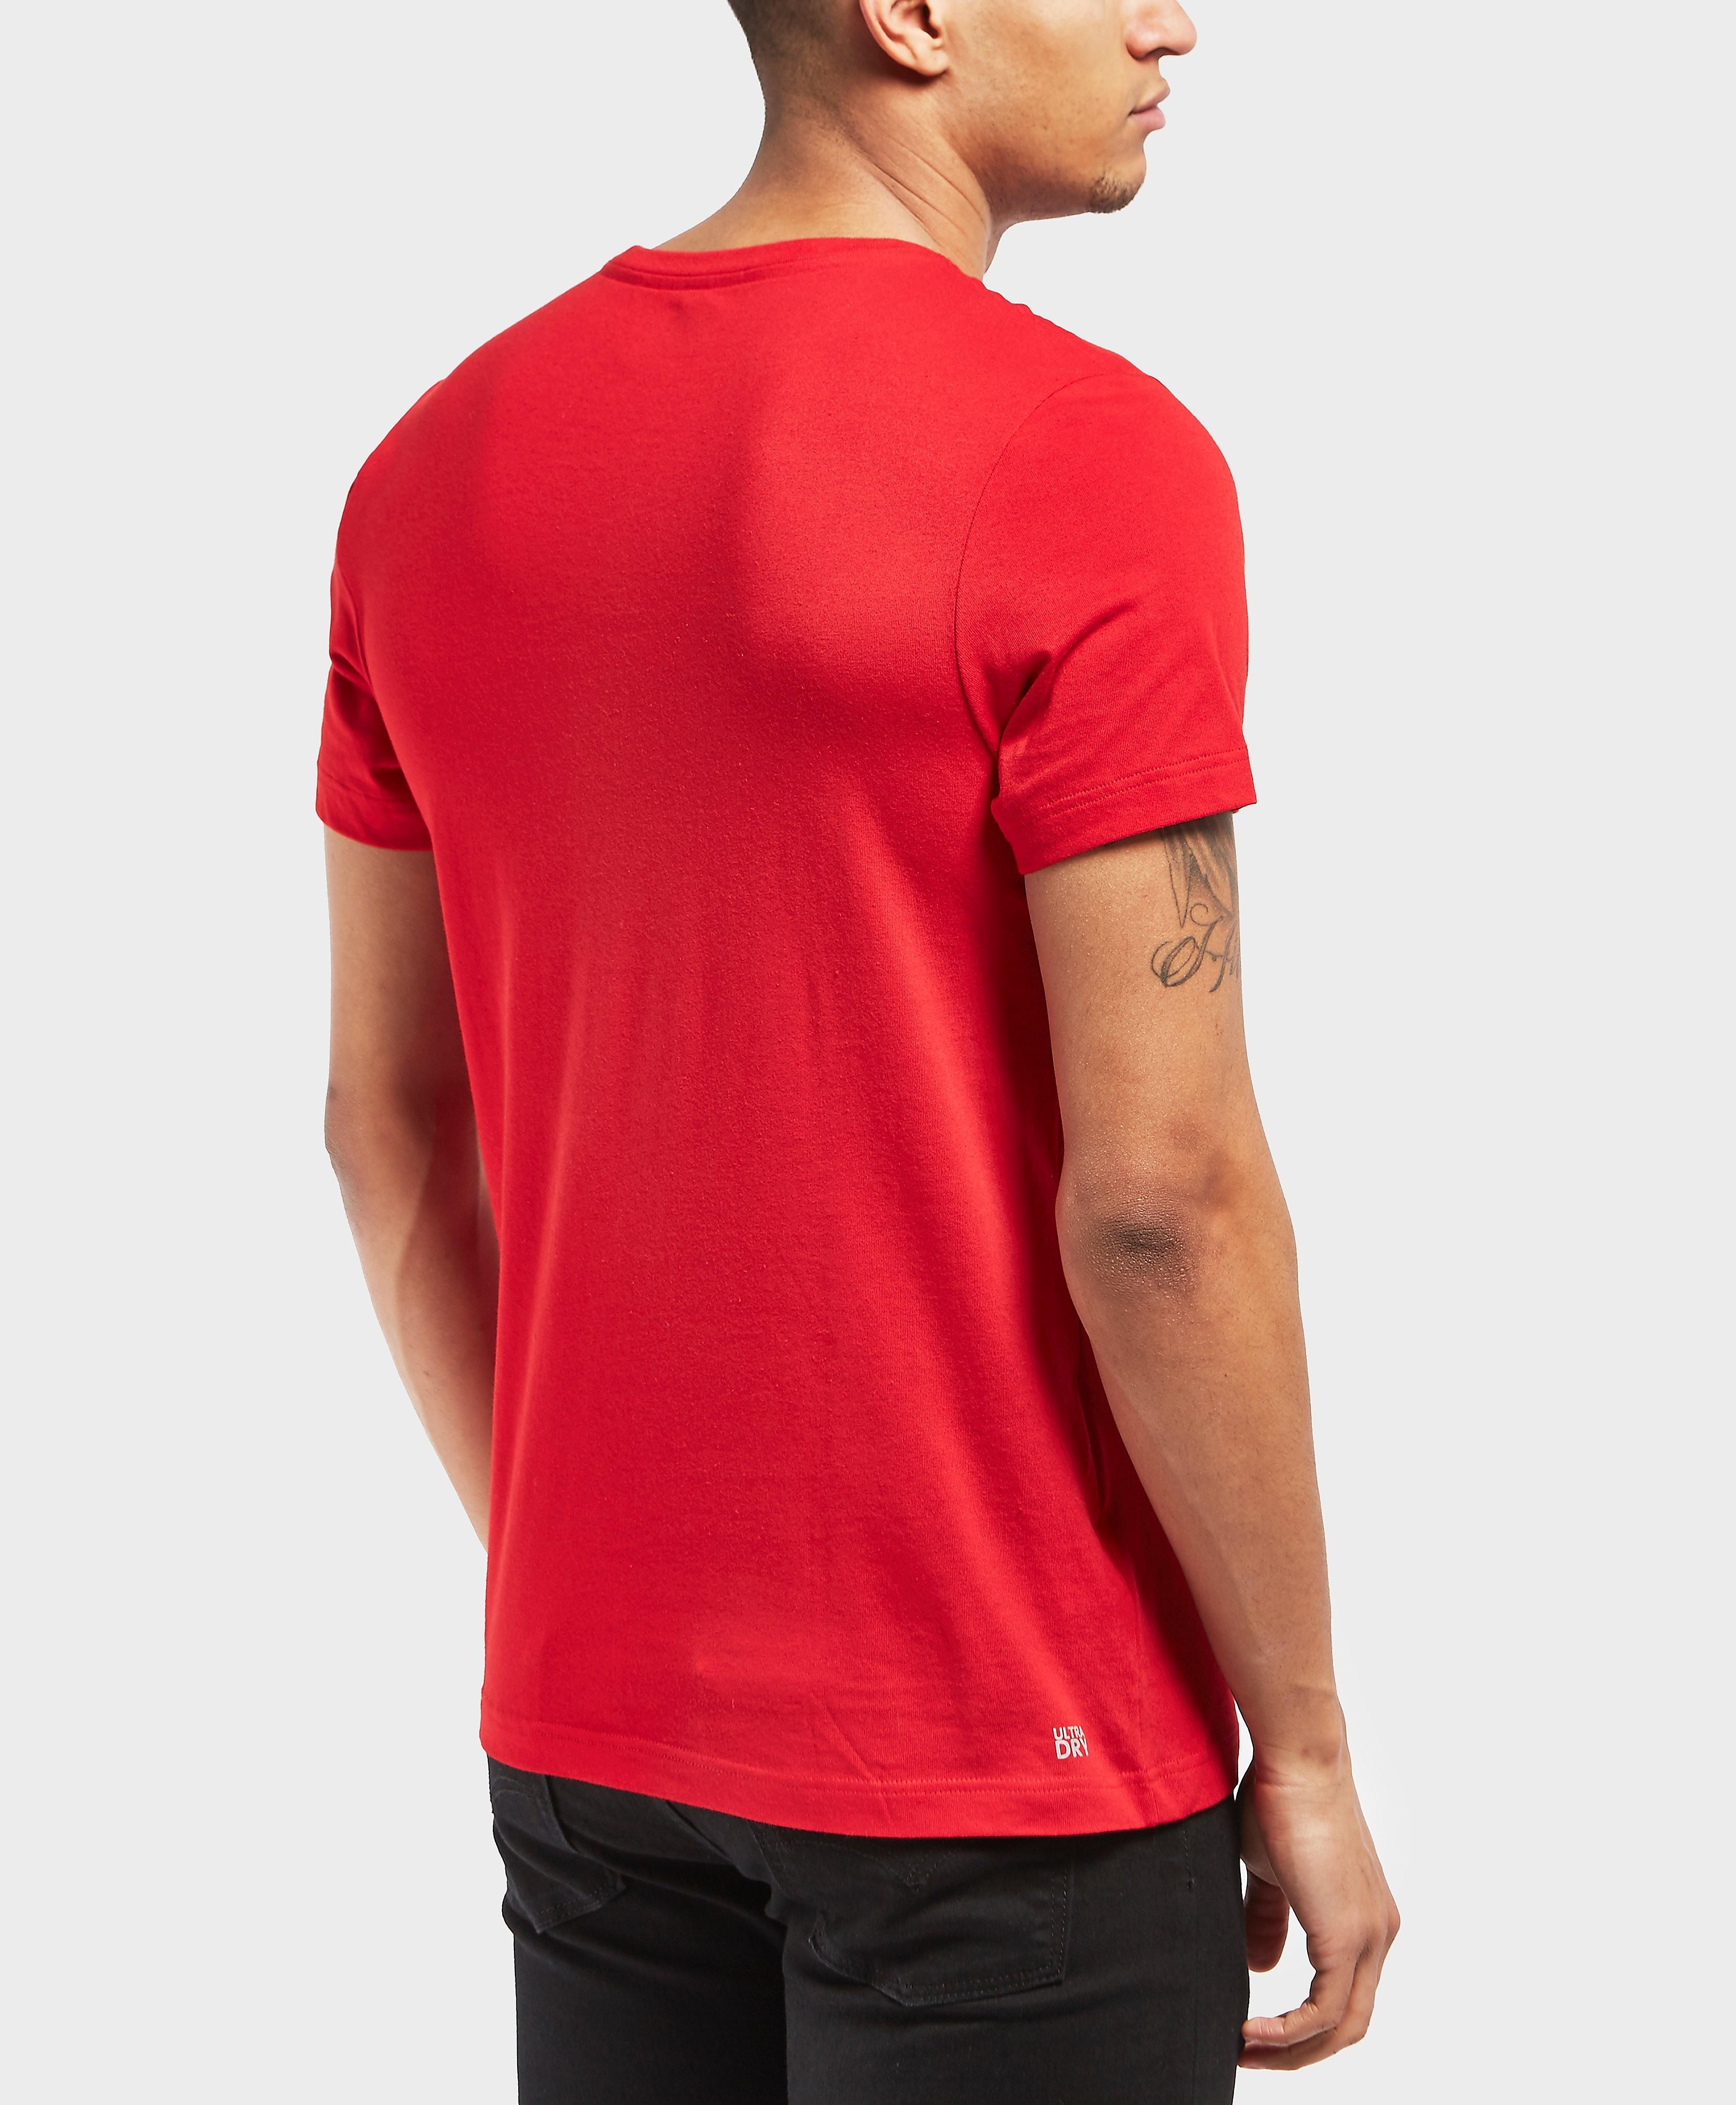 Lacoste Large Croc Short Sleeve T-Shirt